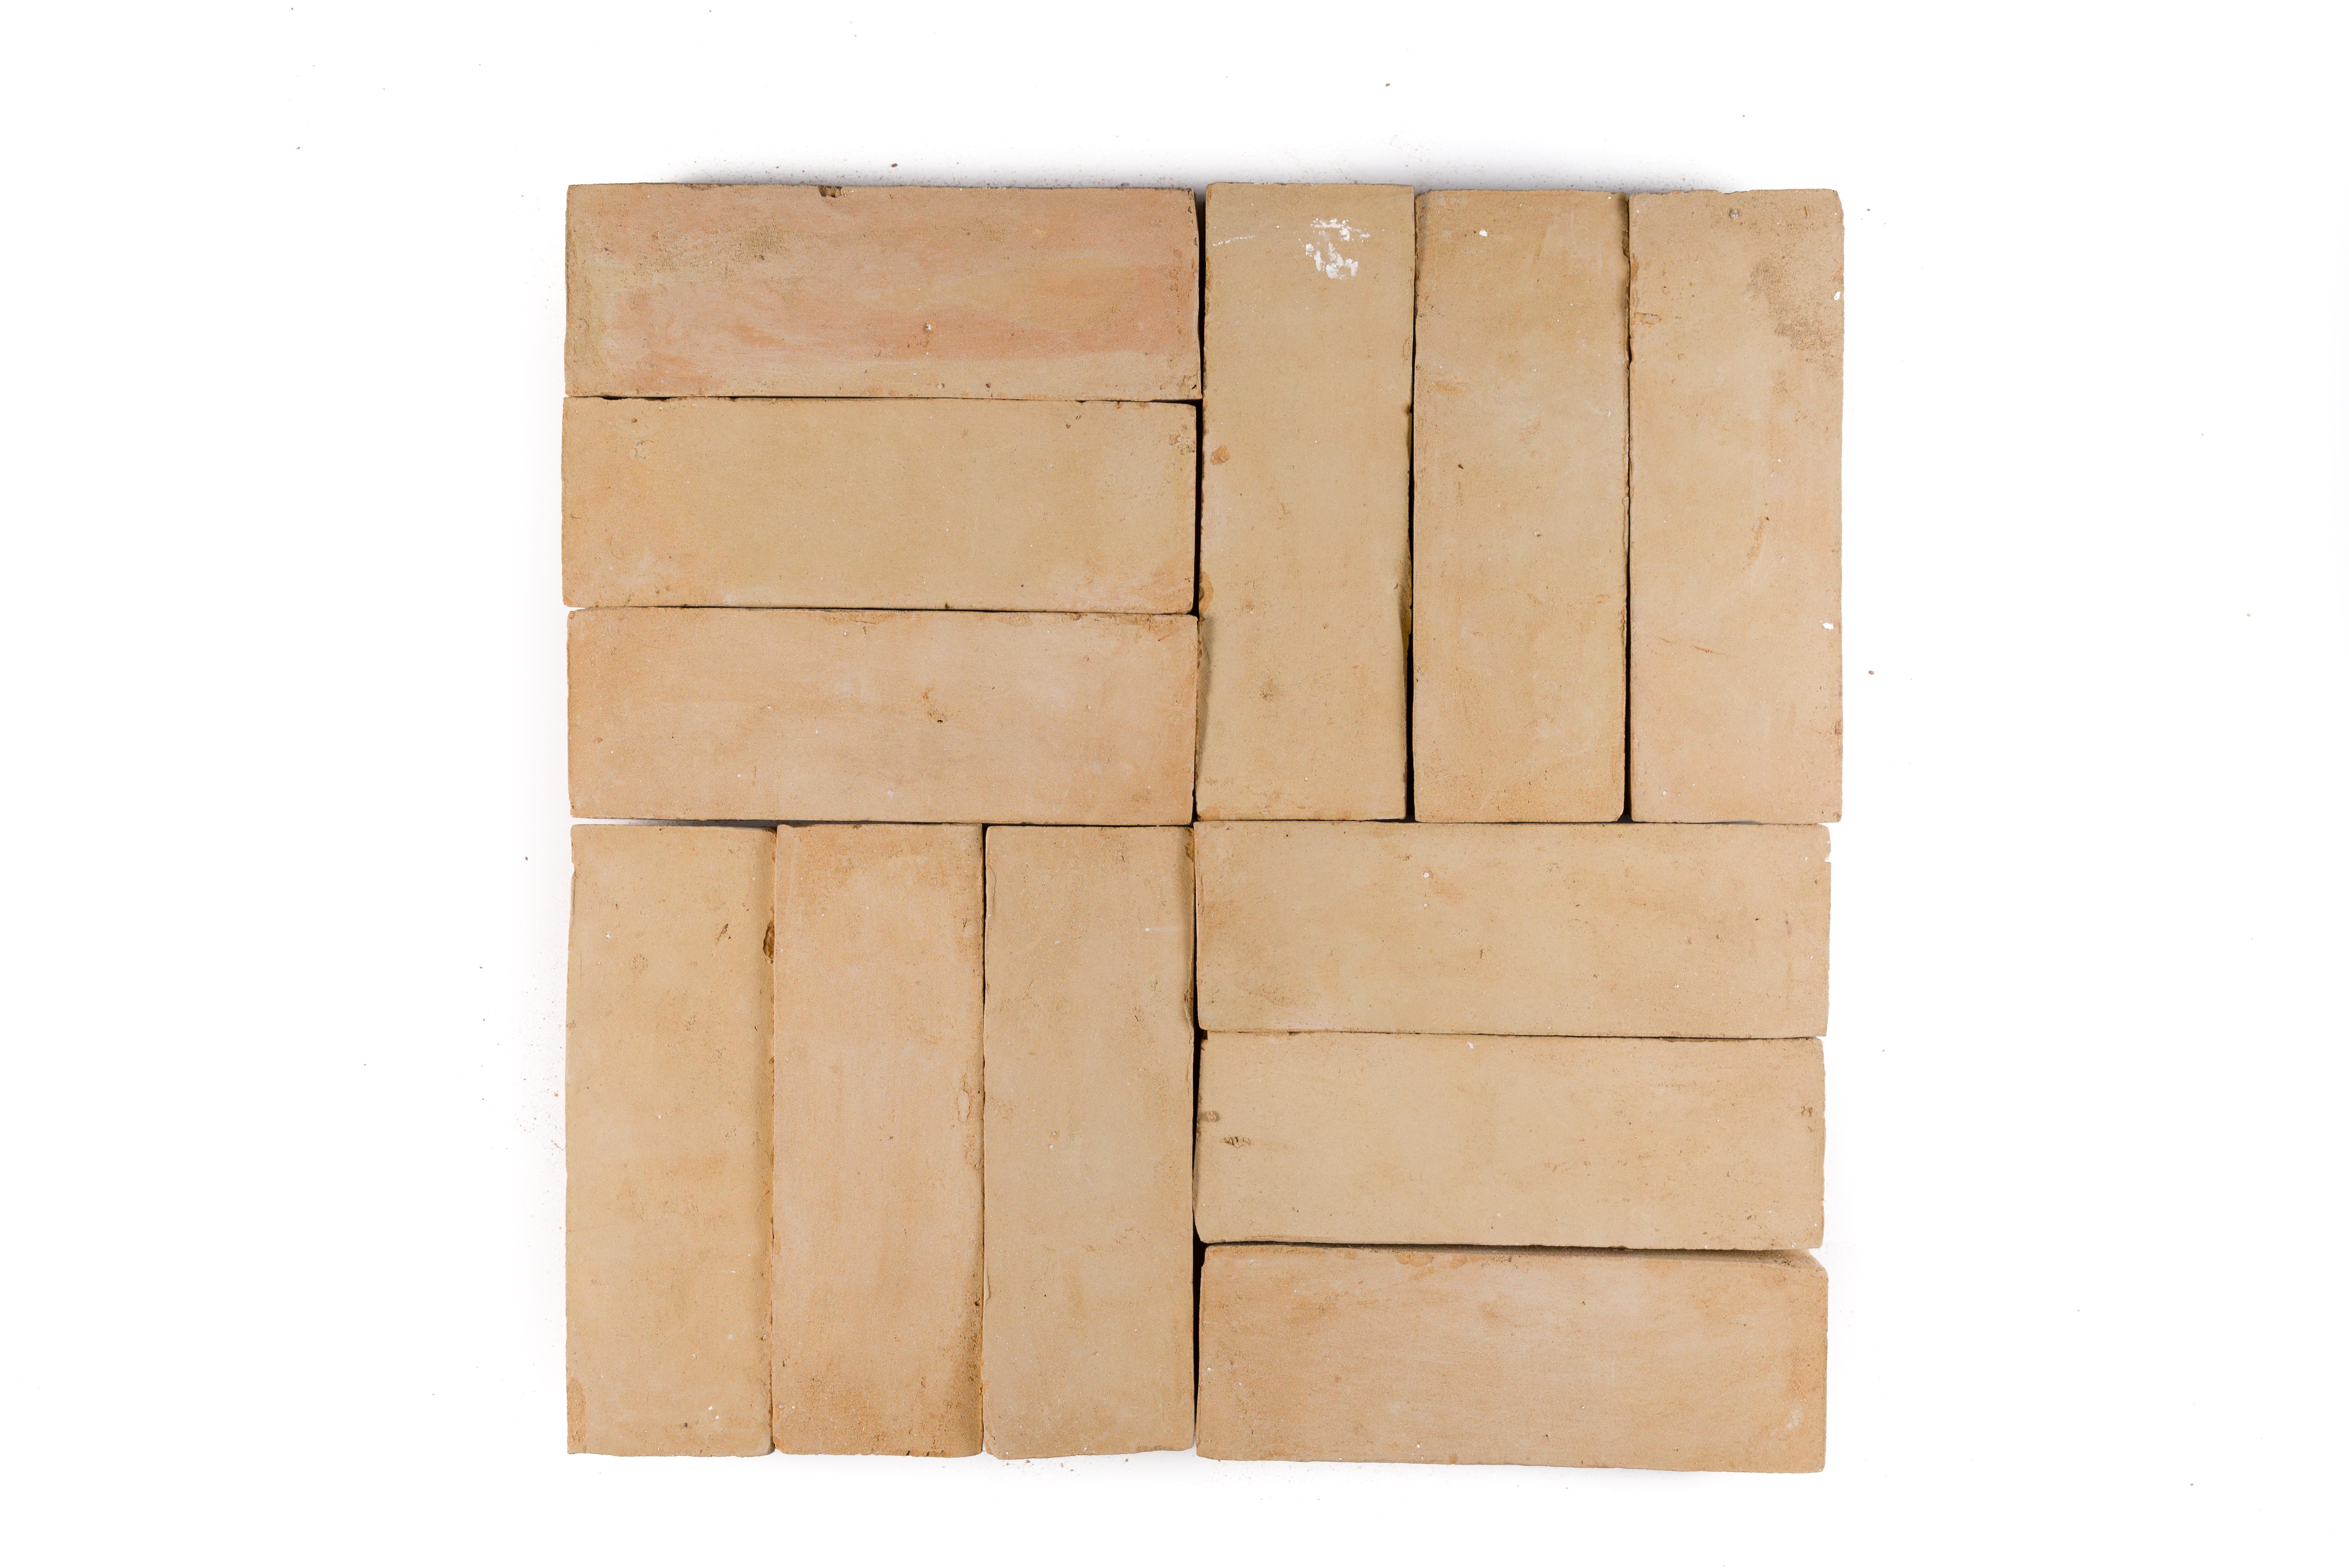 Marokkaanse Tegels Kopen : Faiencetegel archives intercarro tegels natuursteen en parket